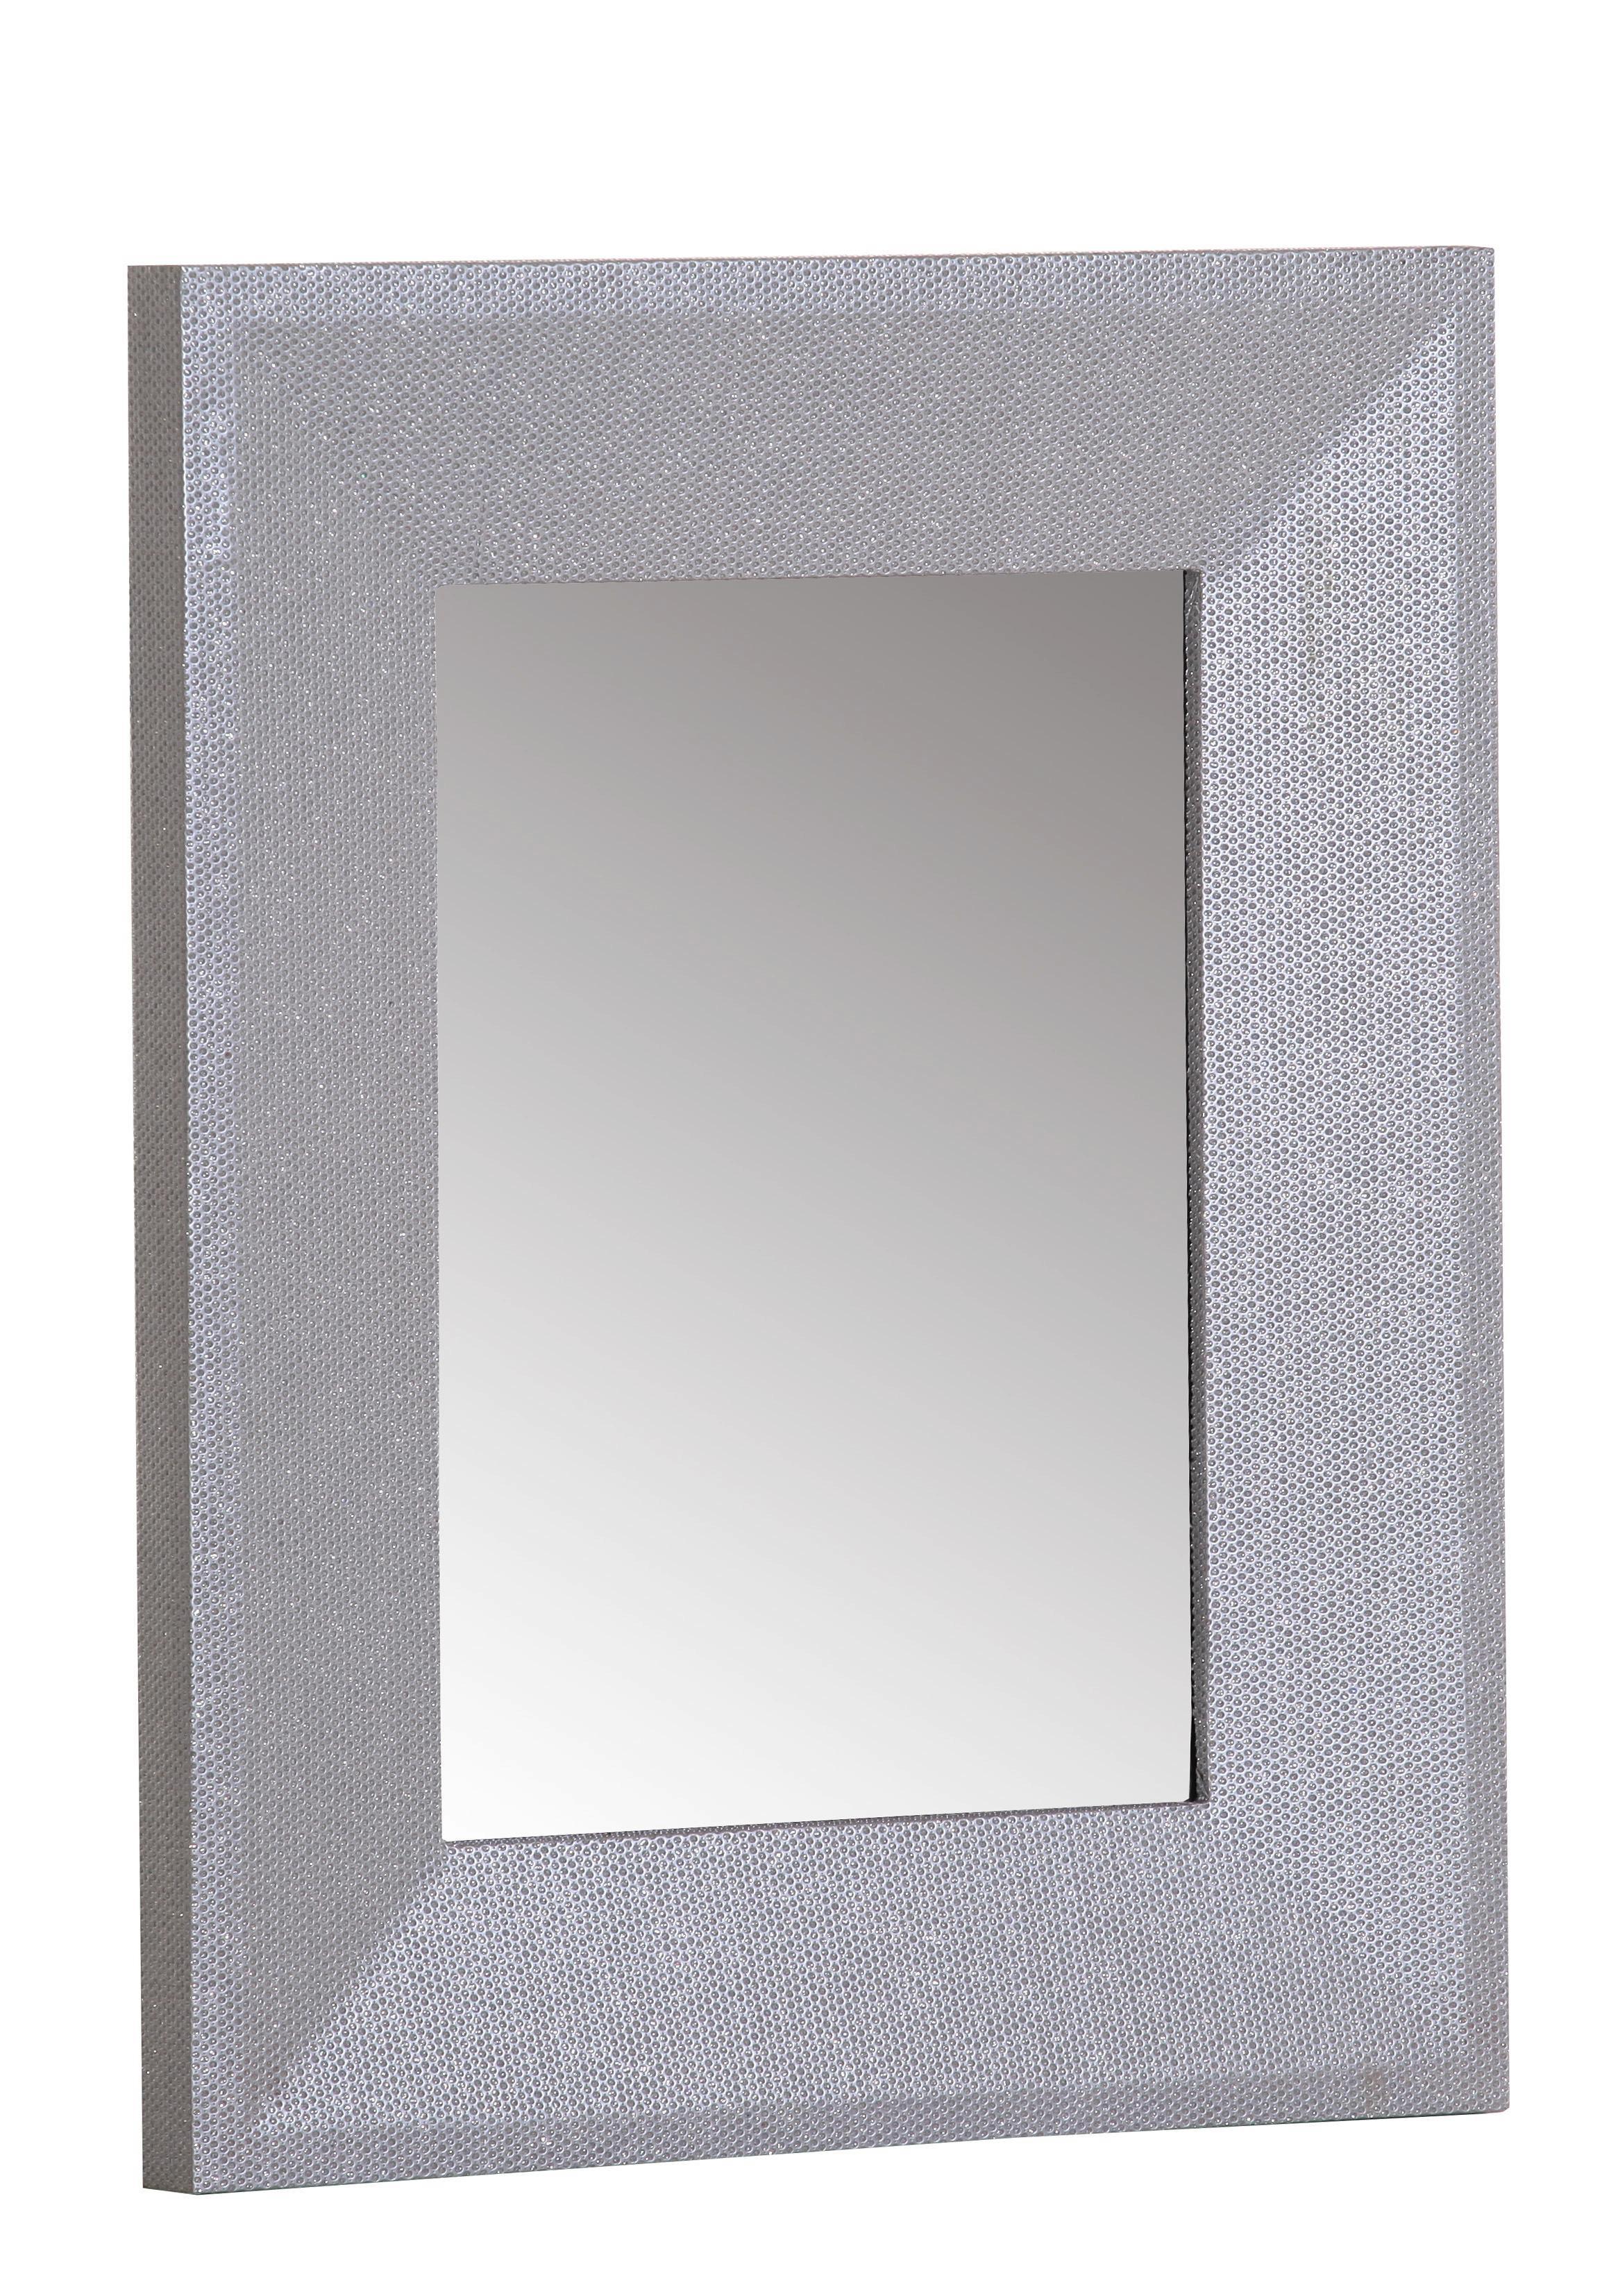 Wandspiegel ca. 80x180x5cm - Silberfarben, Glas/Holz (80/180/5cm) - MÖMAX modern living